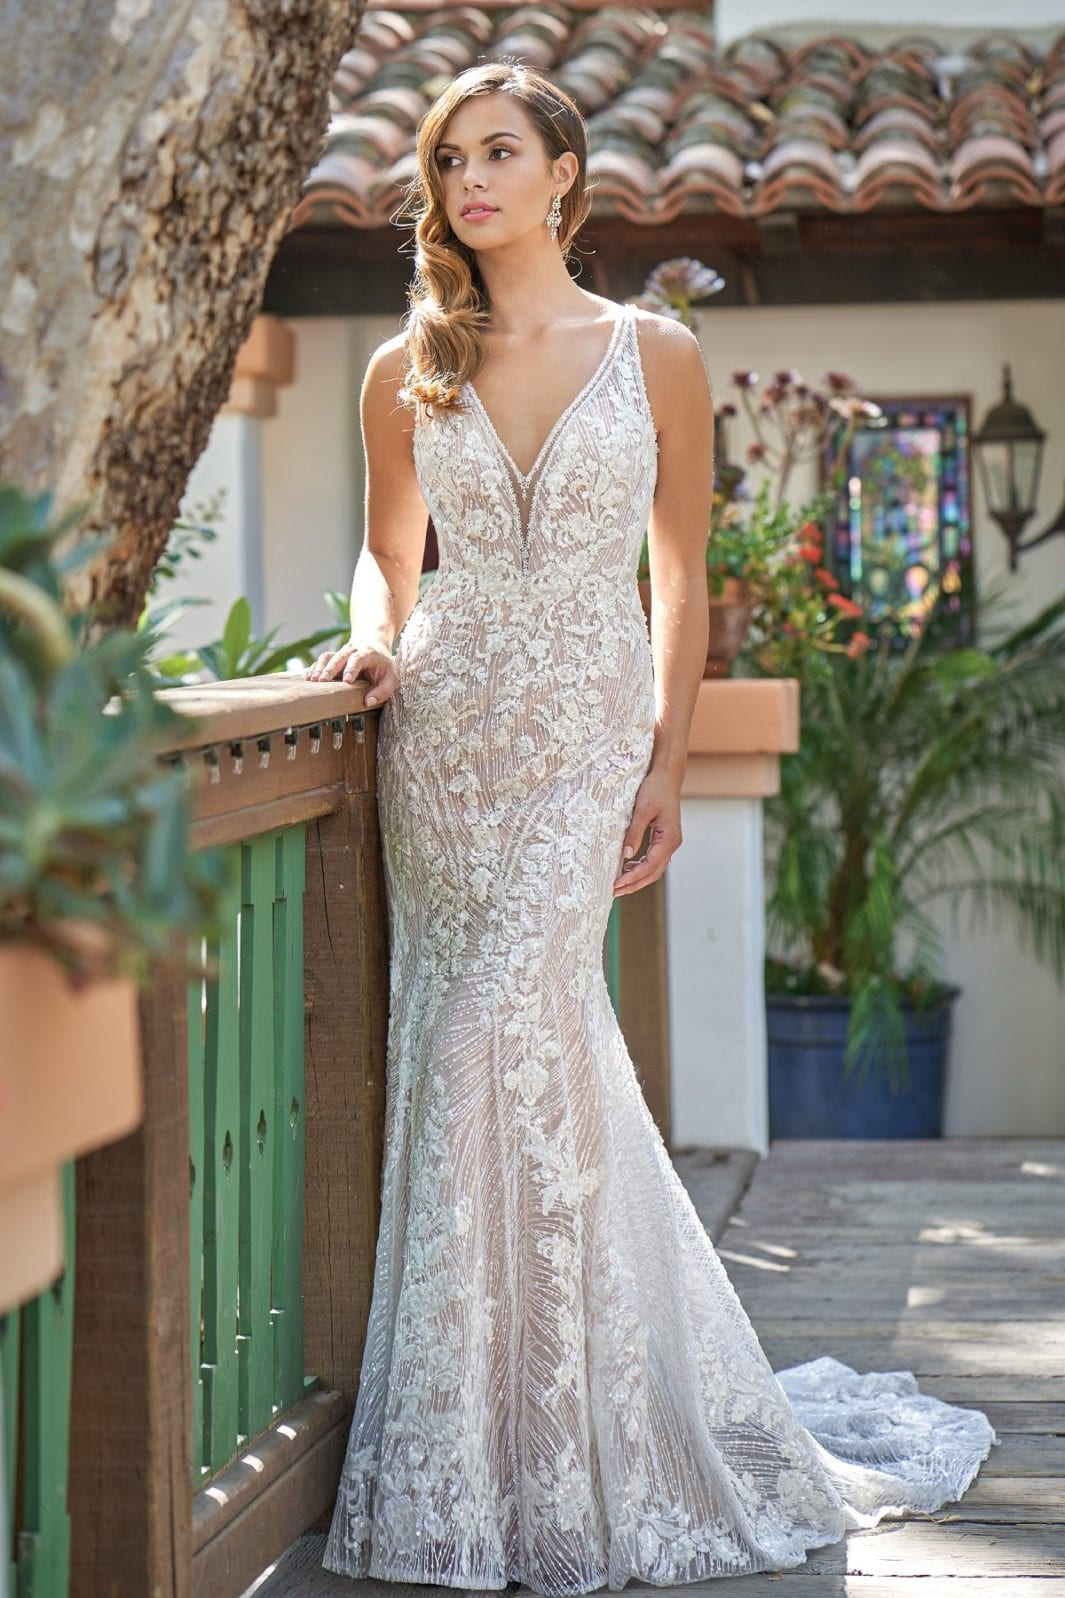 Alexis by Randy Fenoli   To Cherish Bridal Boutique in